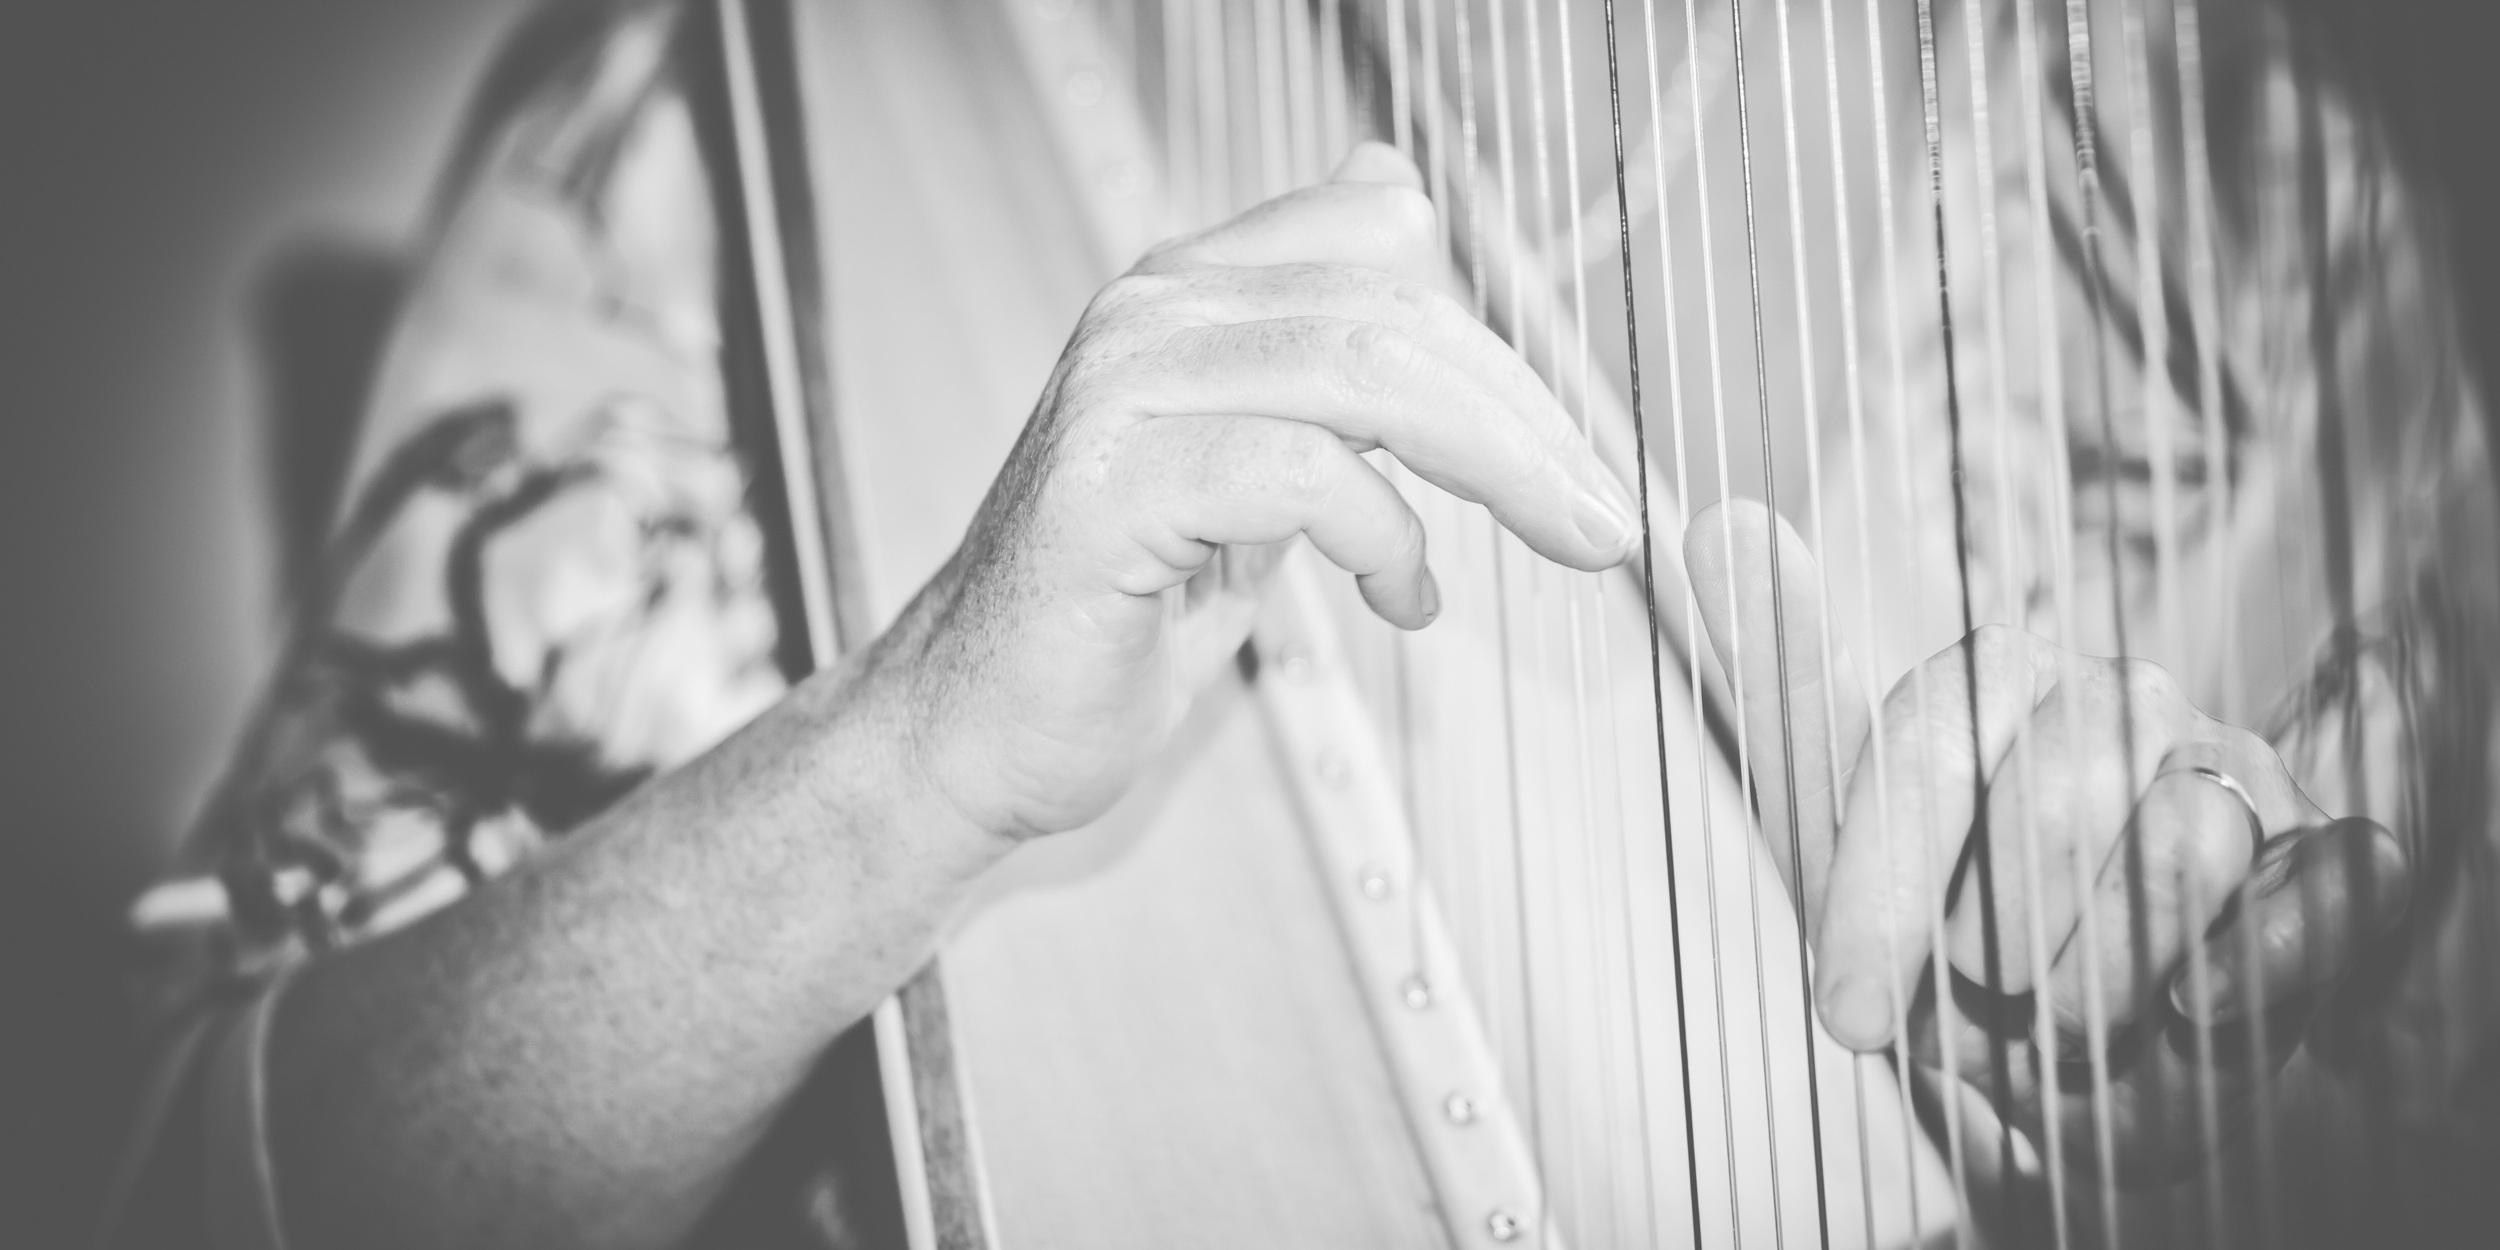 013  - Xenia Horne UK Harpist by Mark Pugh www.markpugh.com -13.JPG